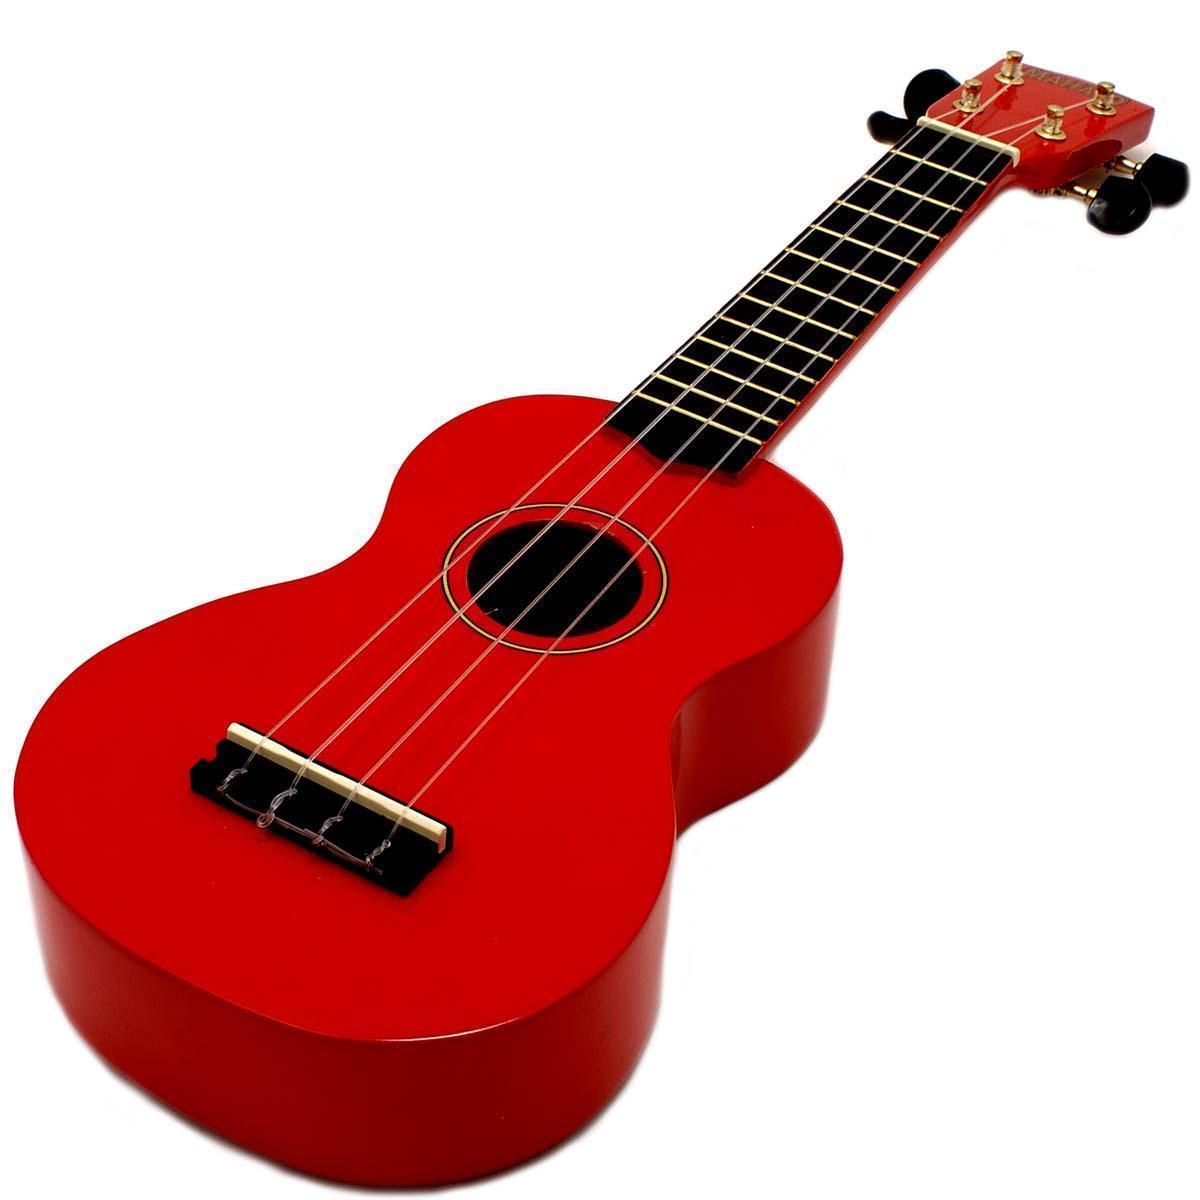 mage result for ukulele clipart